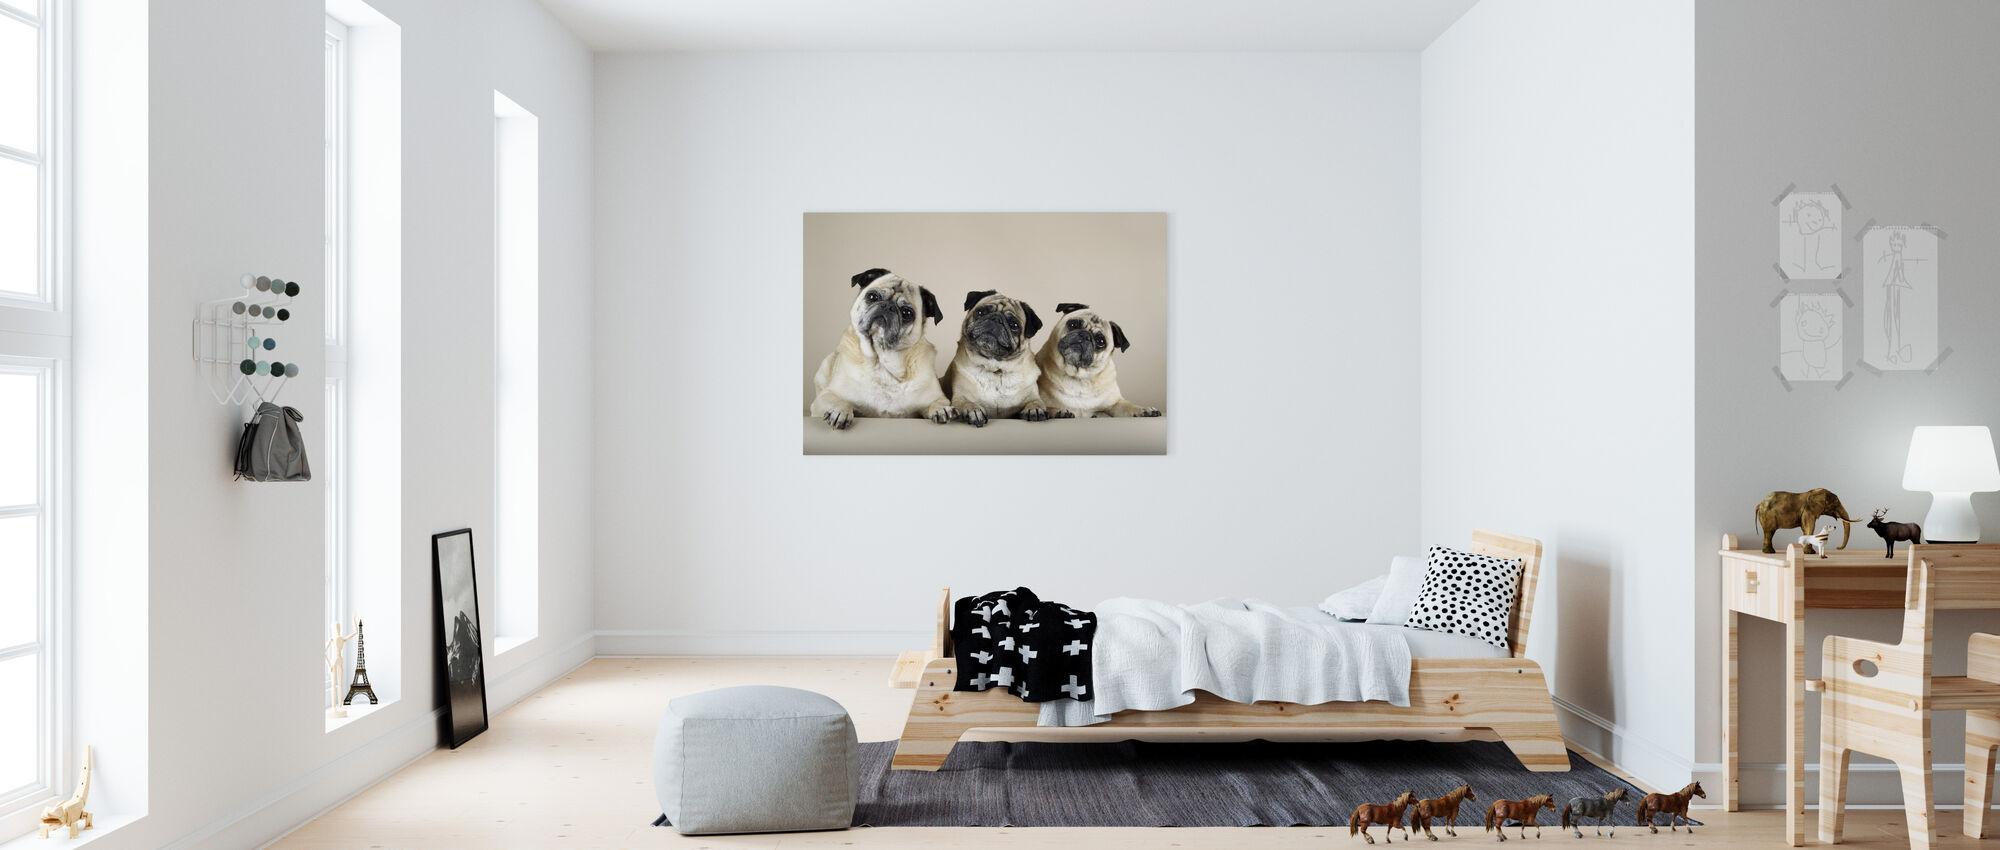 trio impression sur toile de grande qualit photowall. Black Bedroom Furniture Sets. Home Design Ideas